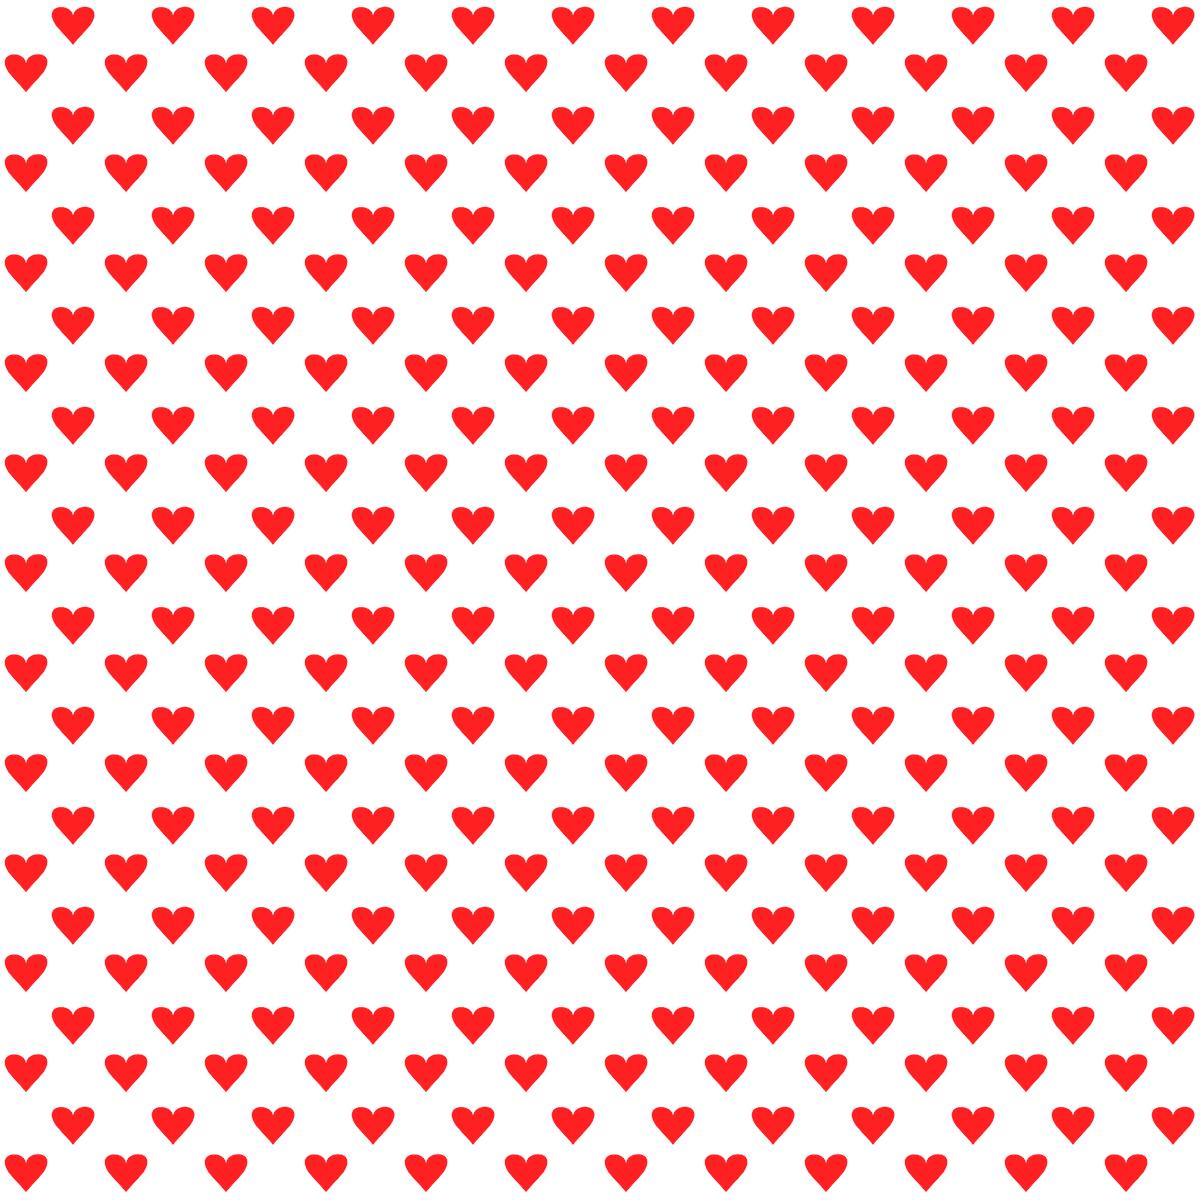 Free Digital Heart Scrapbooking Paper And Tags Papier Mit Herzen Freebie Papier Fur Erinnerungsalben Digital Scrapbook Paper Free Printable Planner Stickers